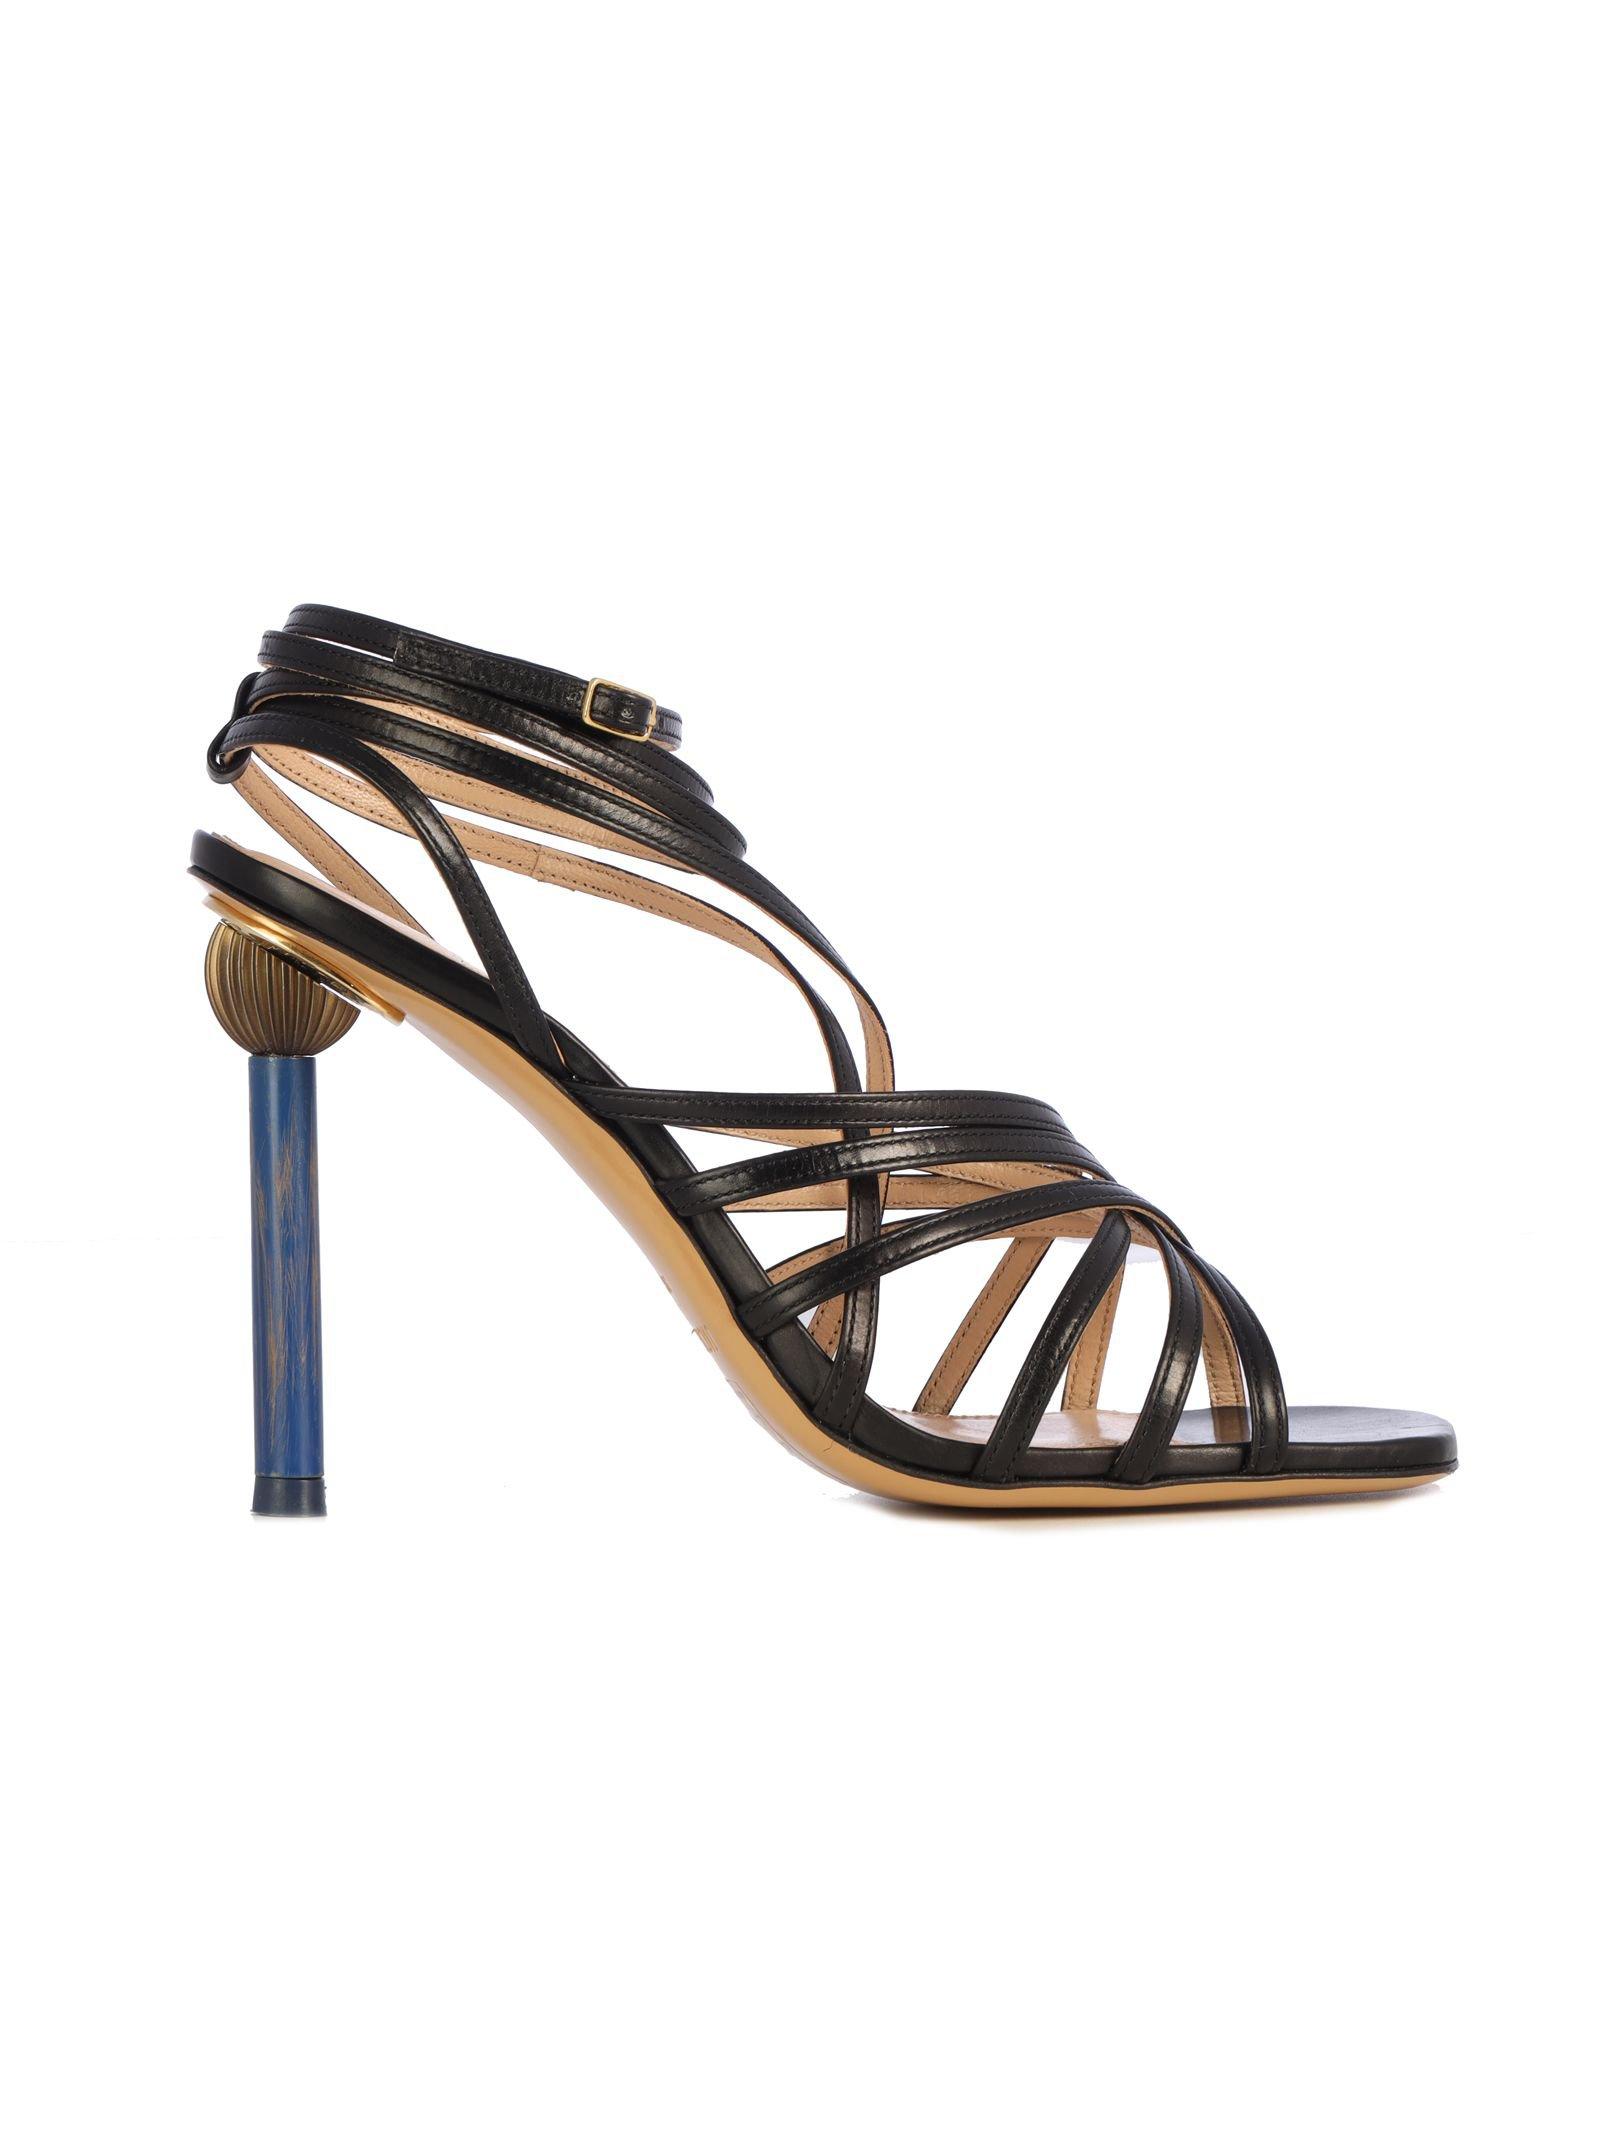 Jacquemus Strappy Sandals